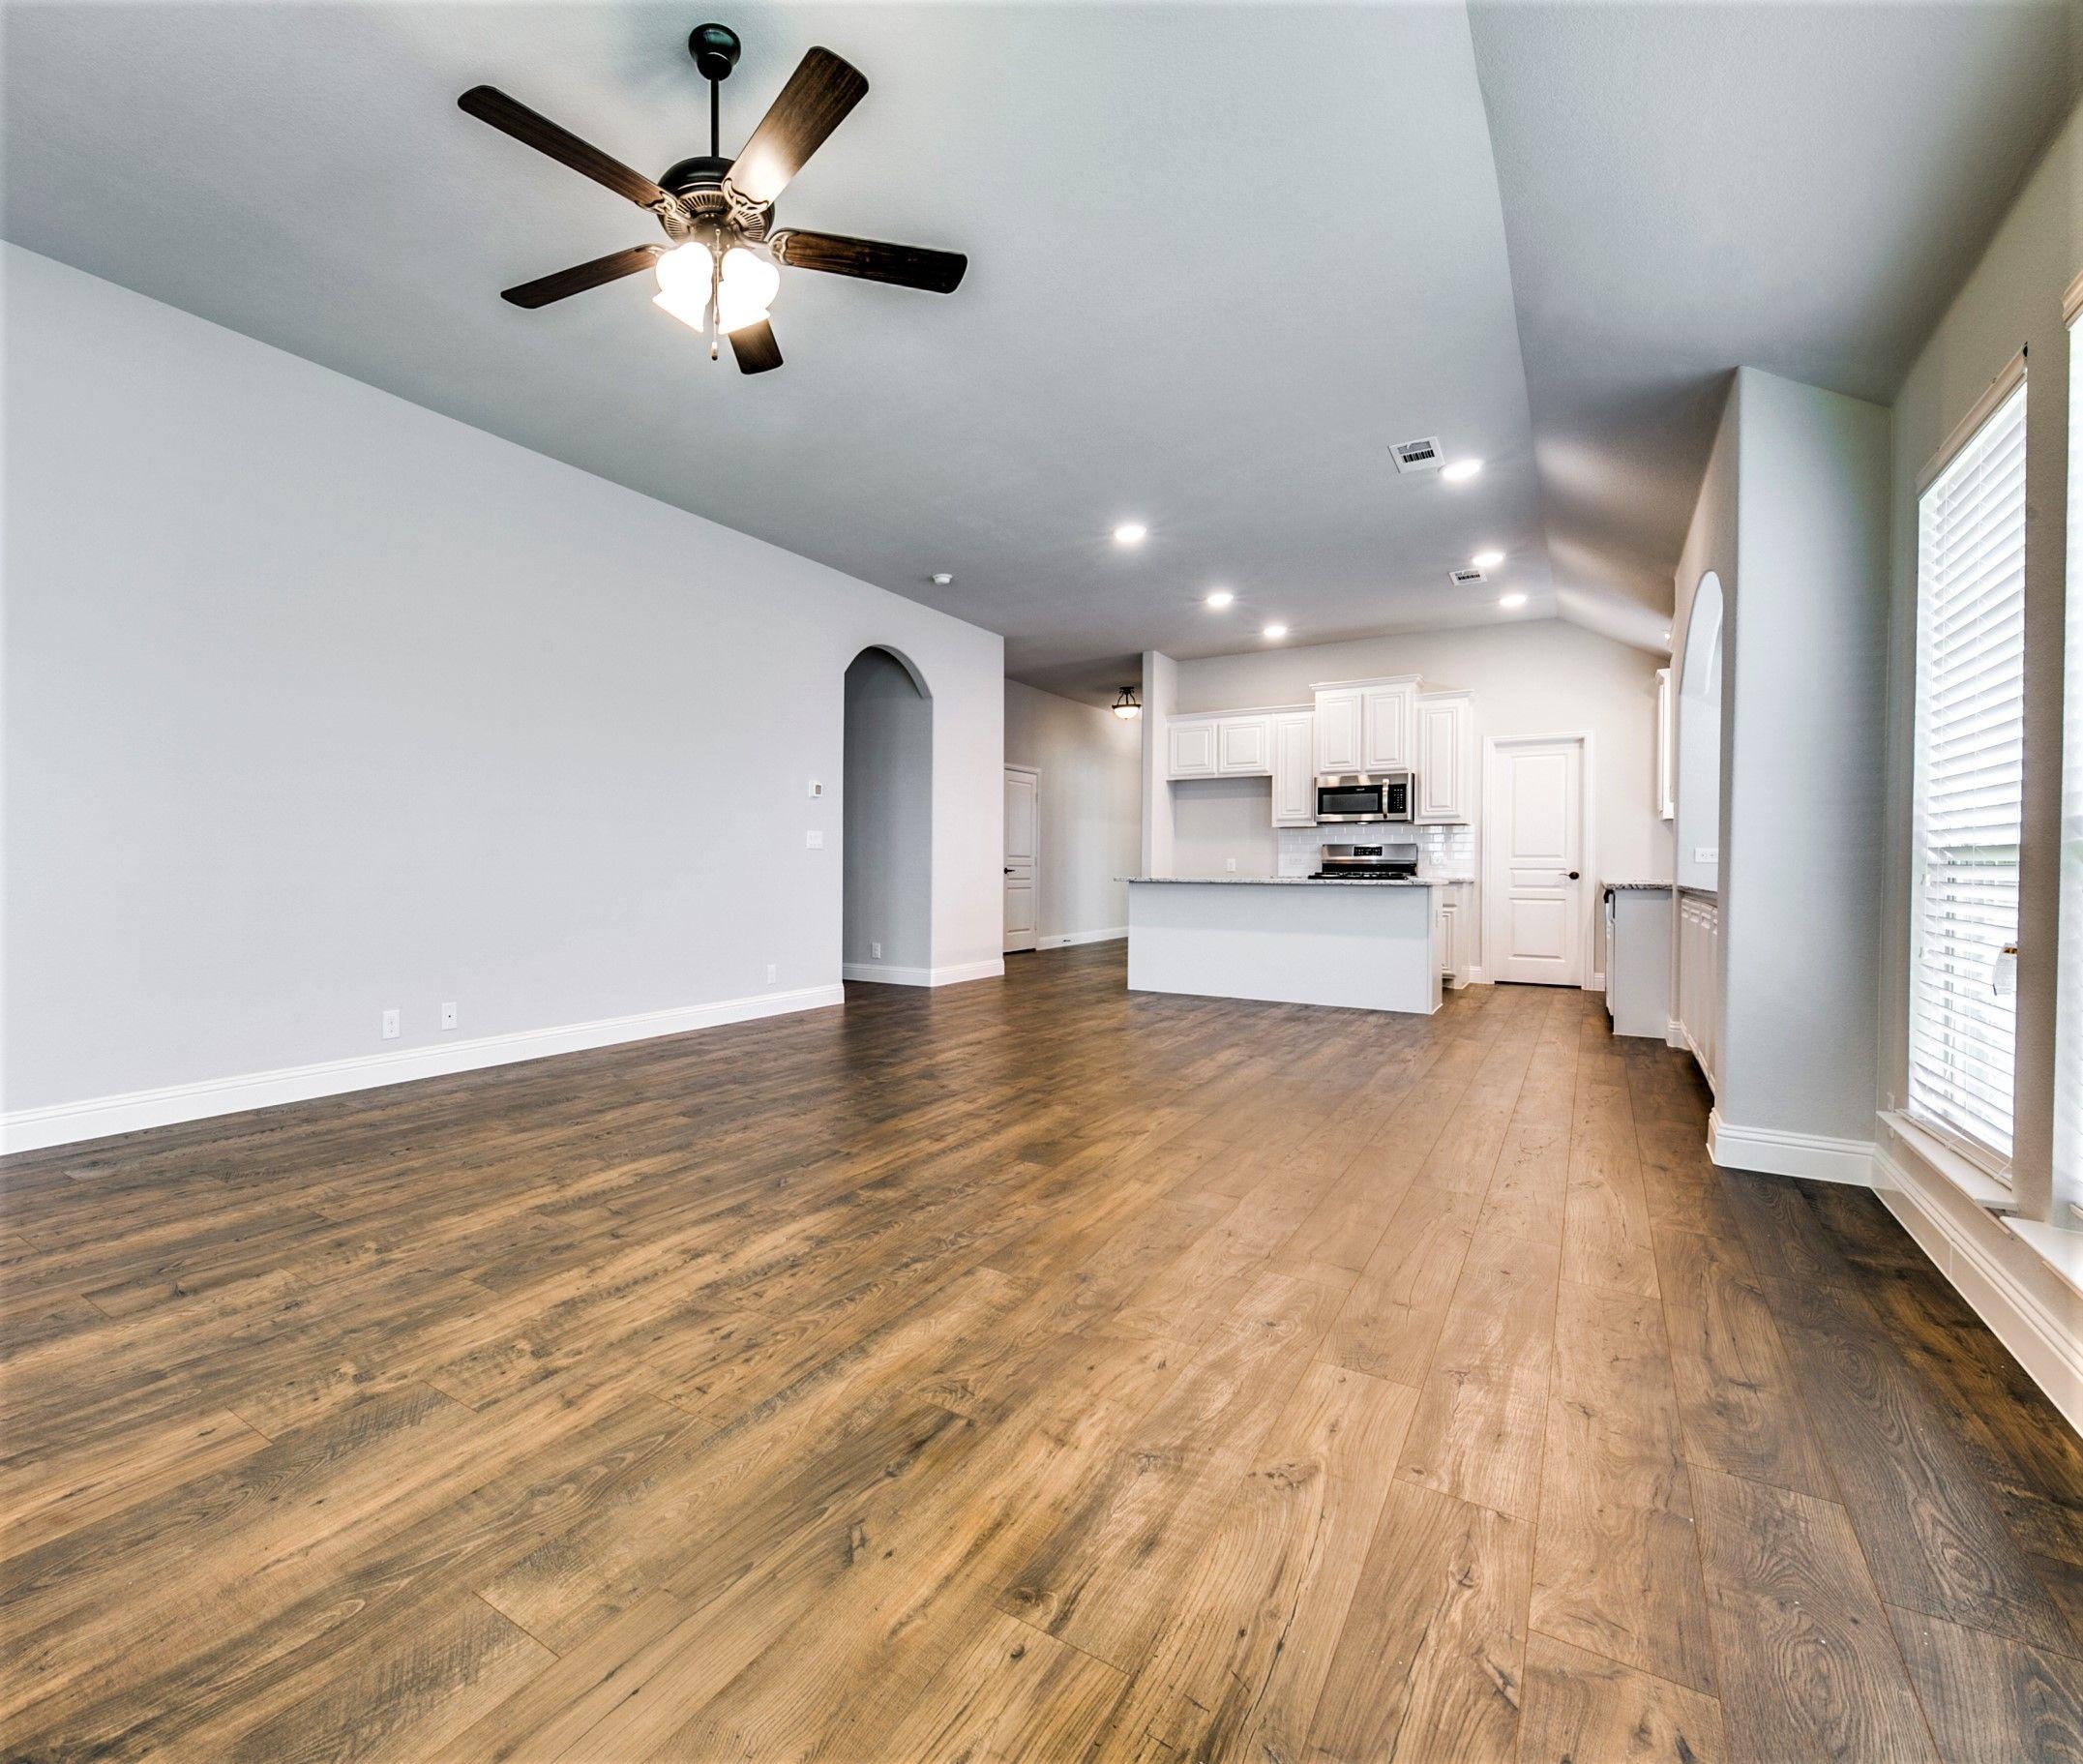 Hardwood floor galore!! flooring floordesign (With